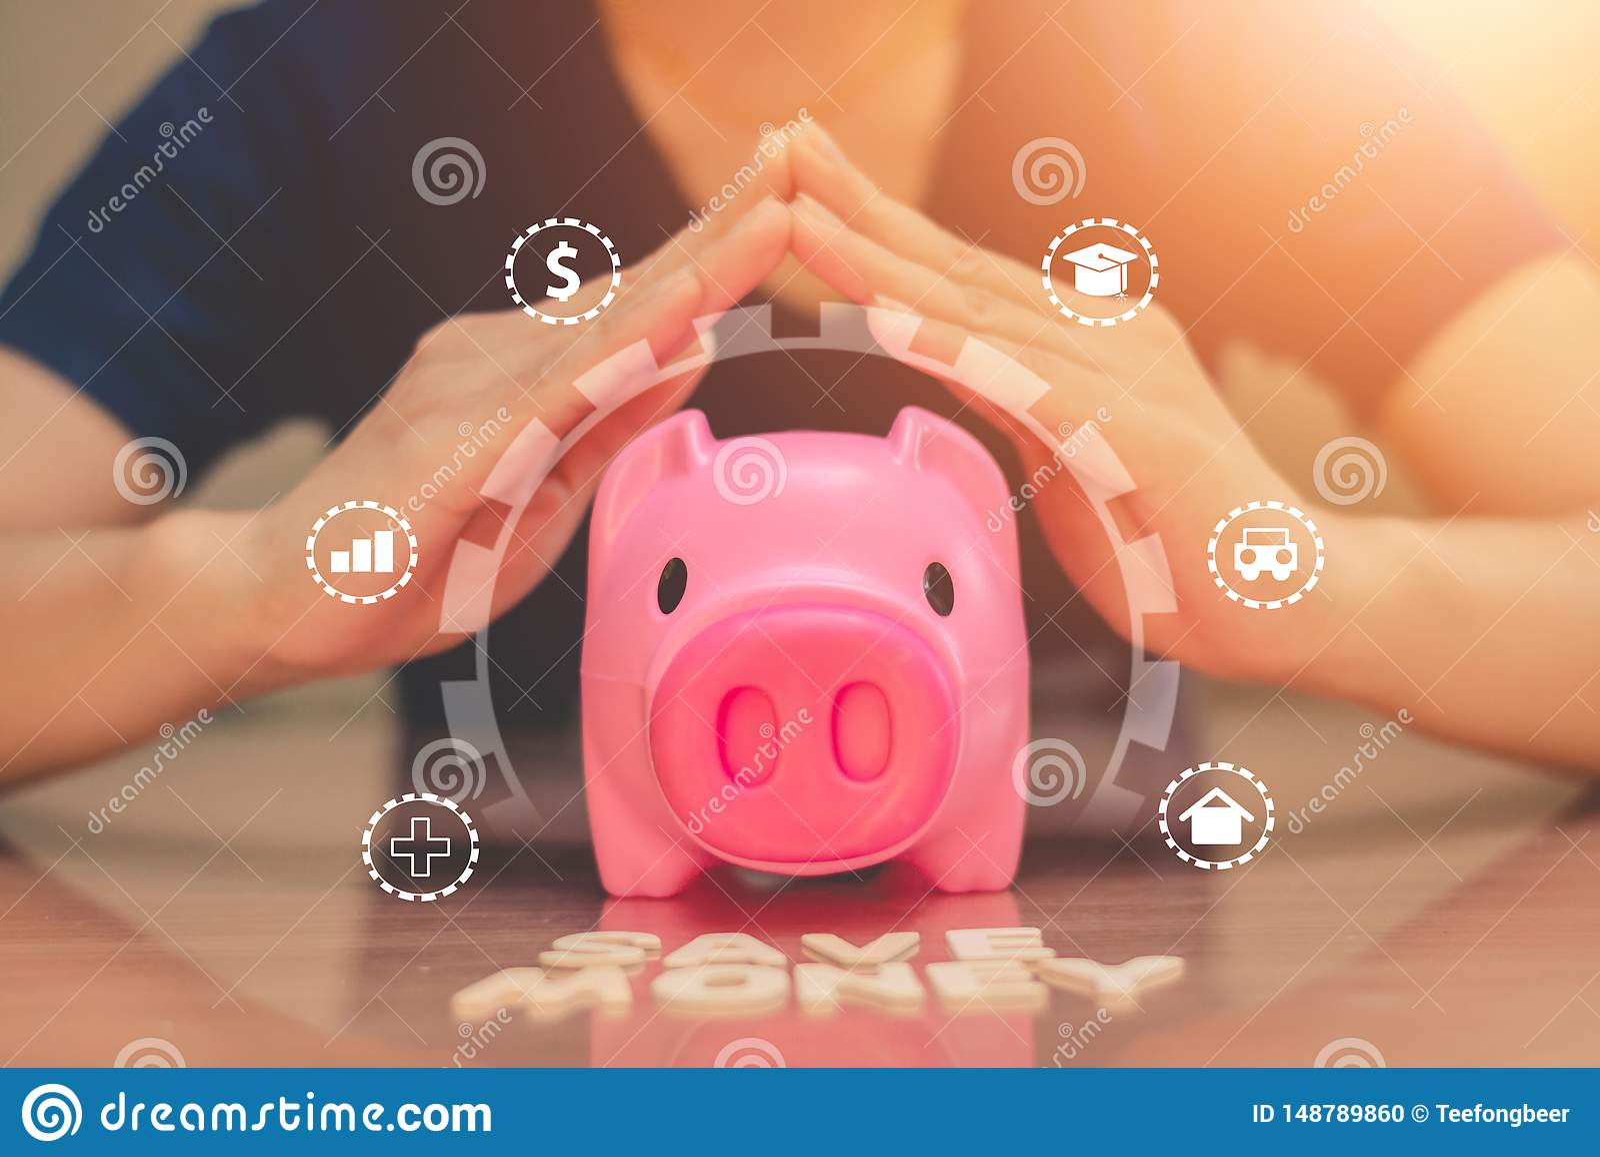 Piggy bank coins with saving money, Concept saving money for the future